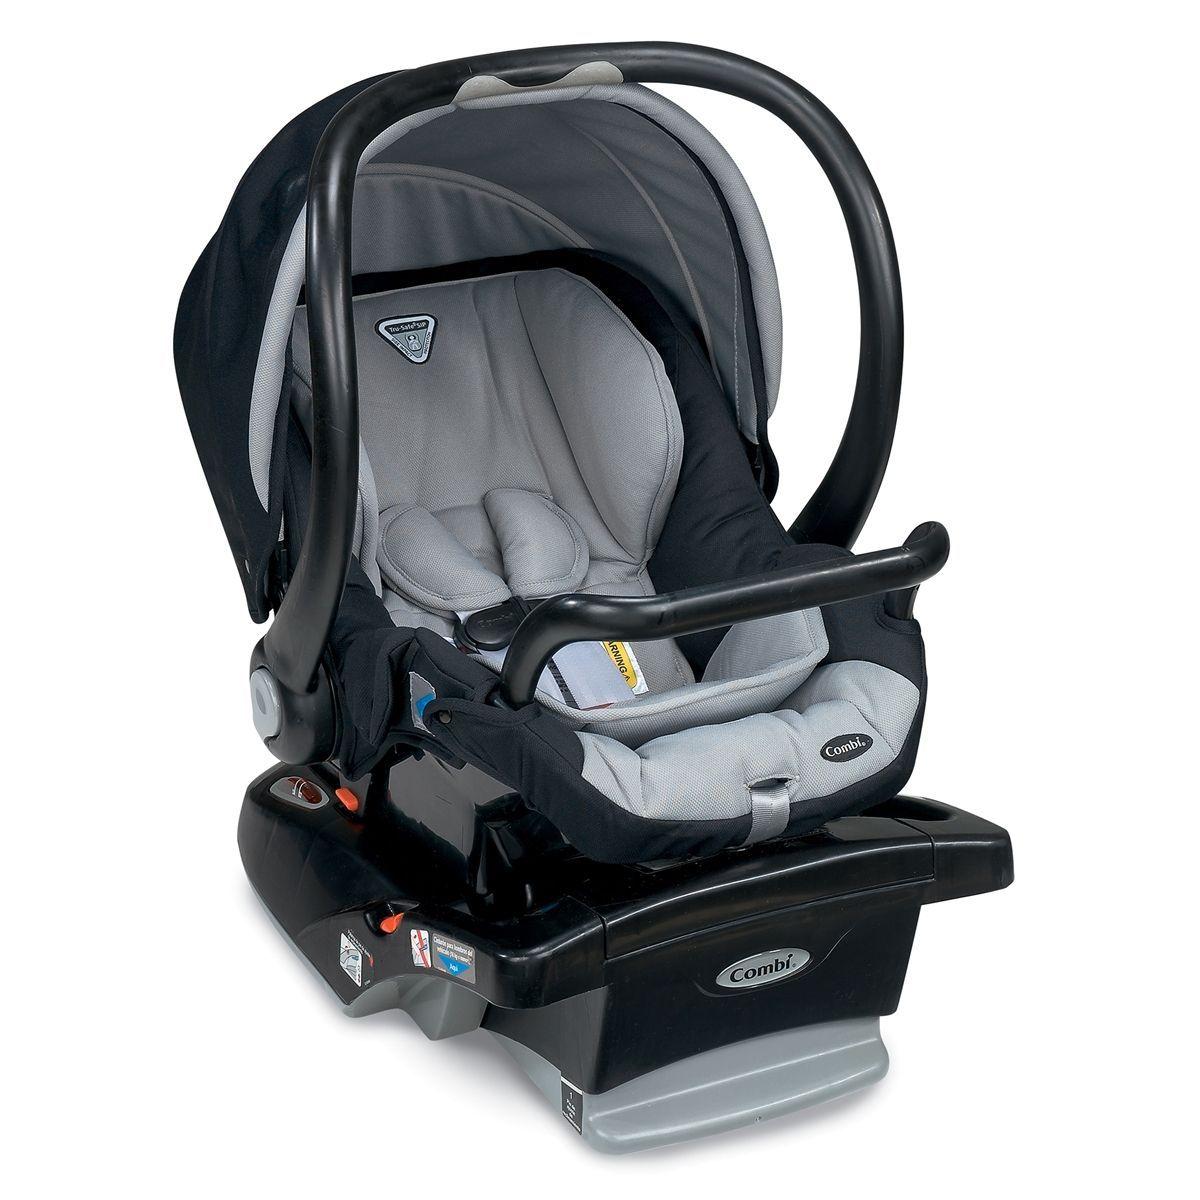 Shuttle Infant Car Seat Baby Car Seats Best Car Seats Car Seats